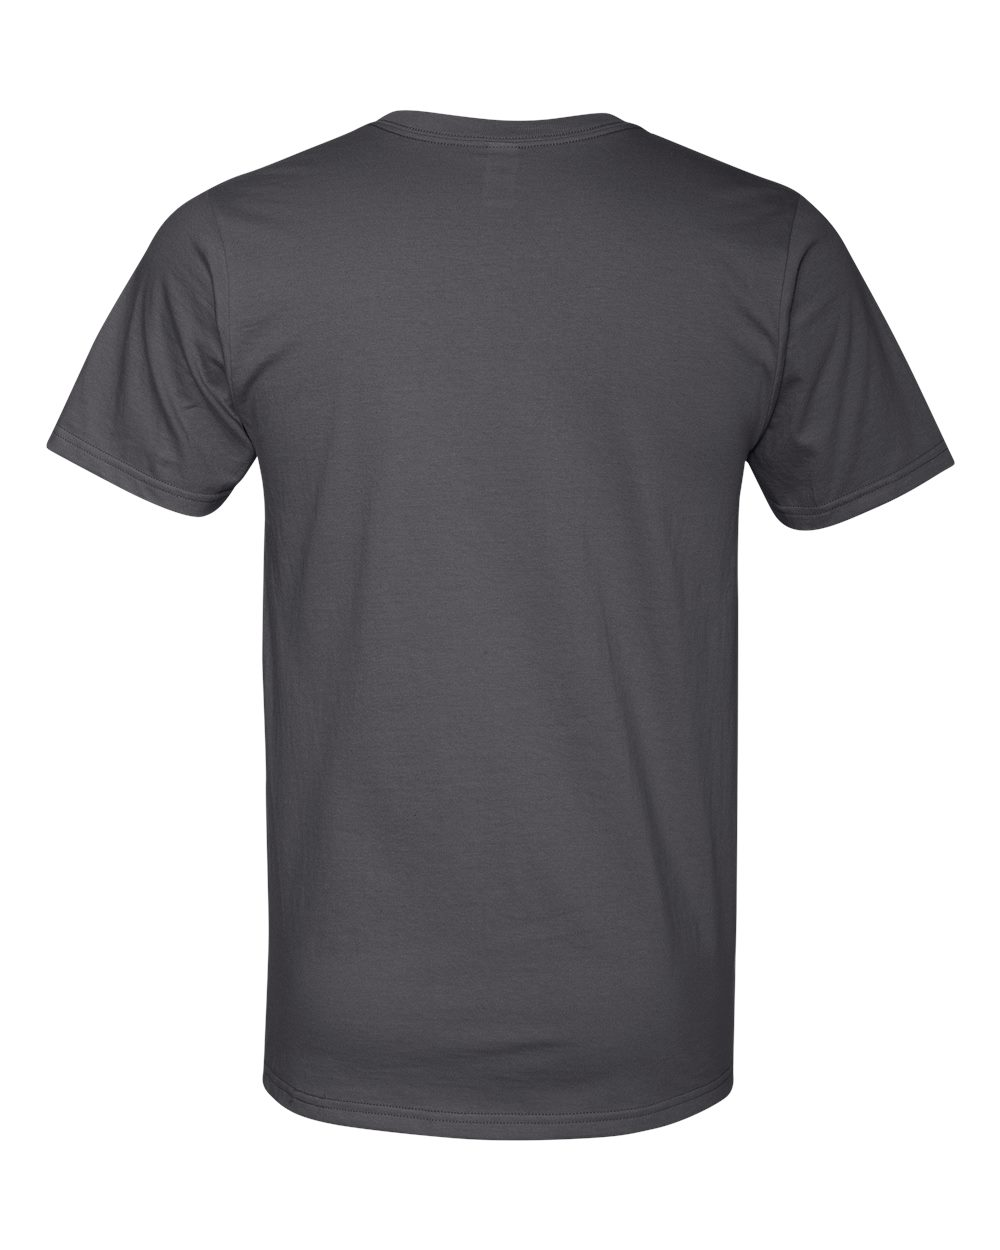 Anvil-Men-039-s-Lightweight-V-Neck-T-Shirt-982-S-3XL thumbnail 7